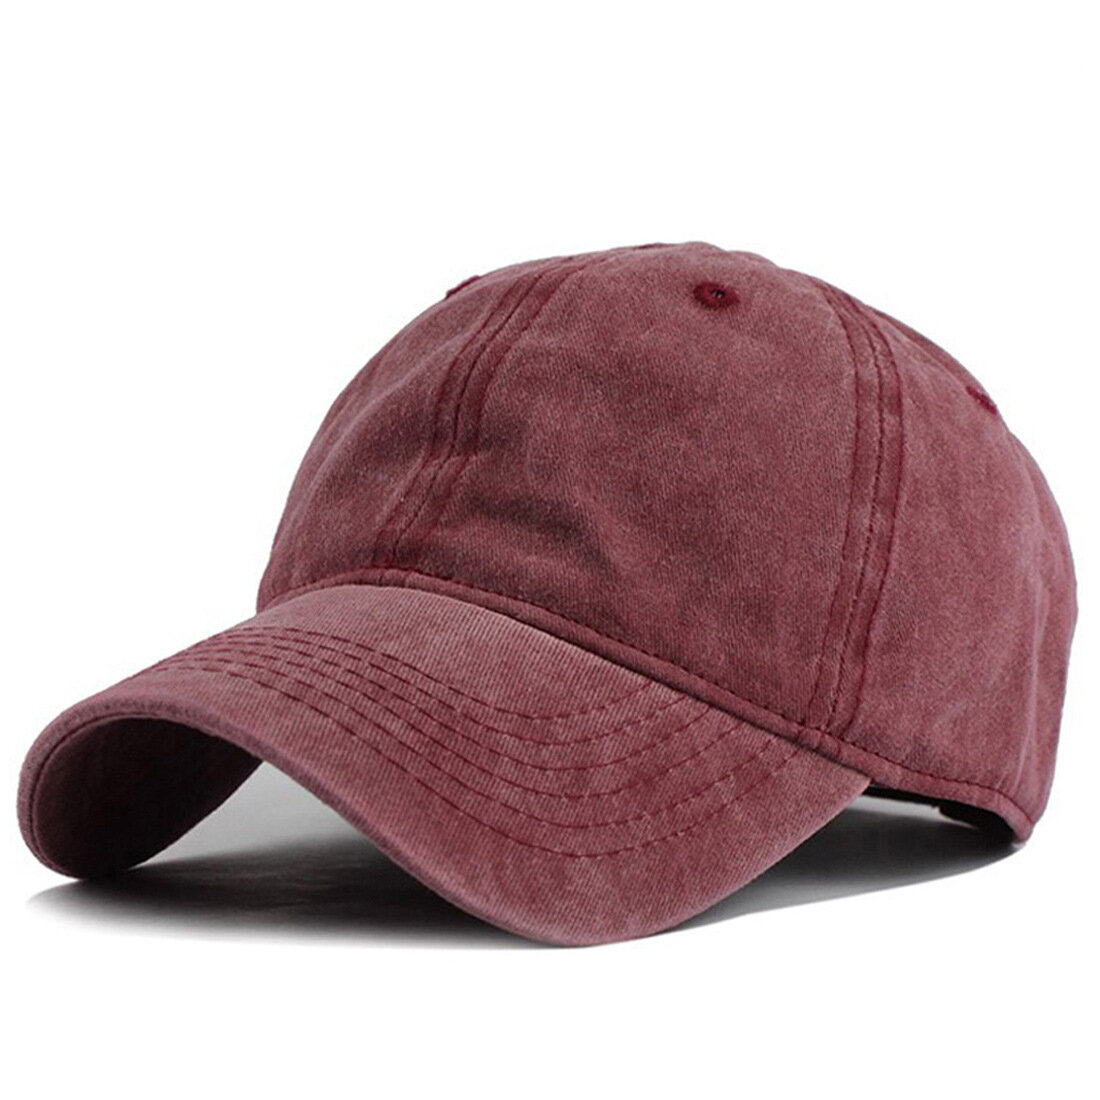 162f7db7 Mens Summer Adjustable Washed Denim Baseball Caps Outdoor Trucker Cap Dad  Hats COD